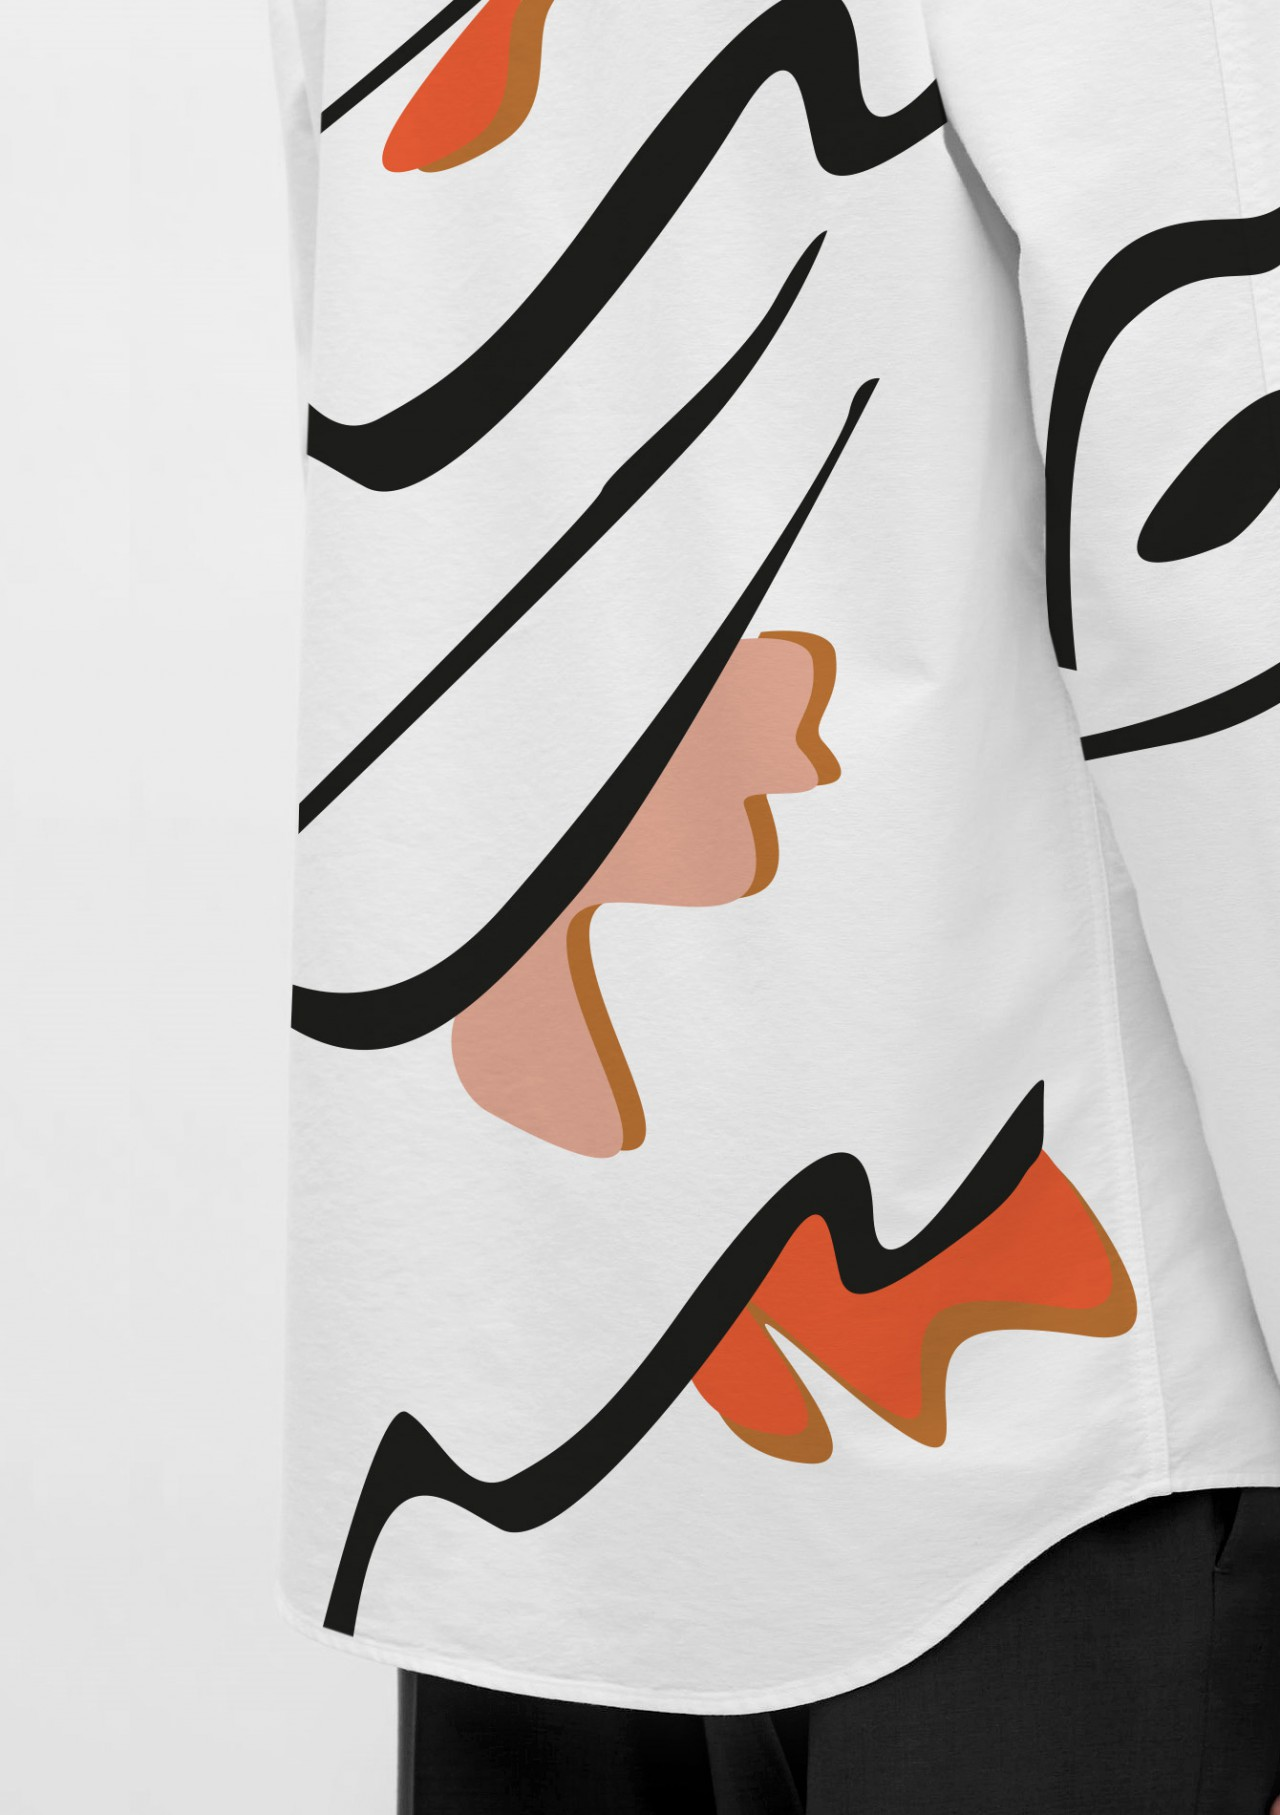 Nadine Goepfert New Ancestors, SS16, Textiles, 2015